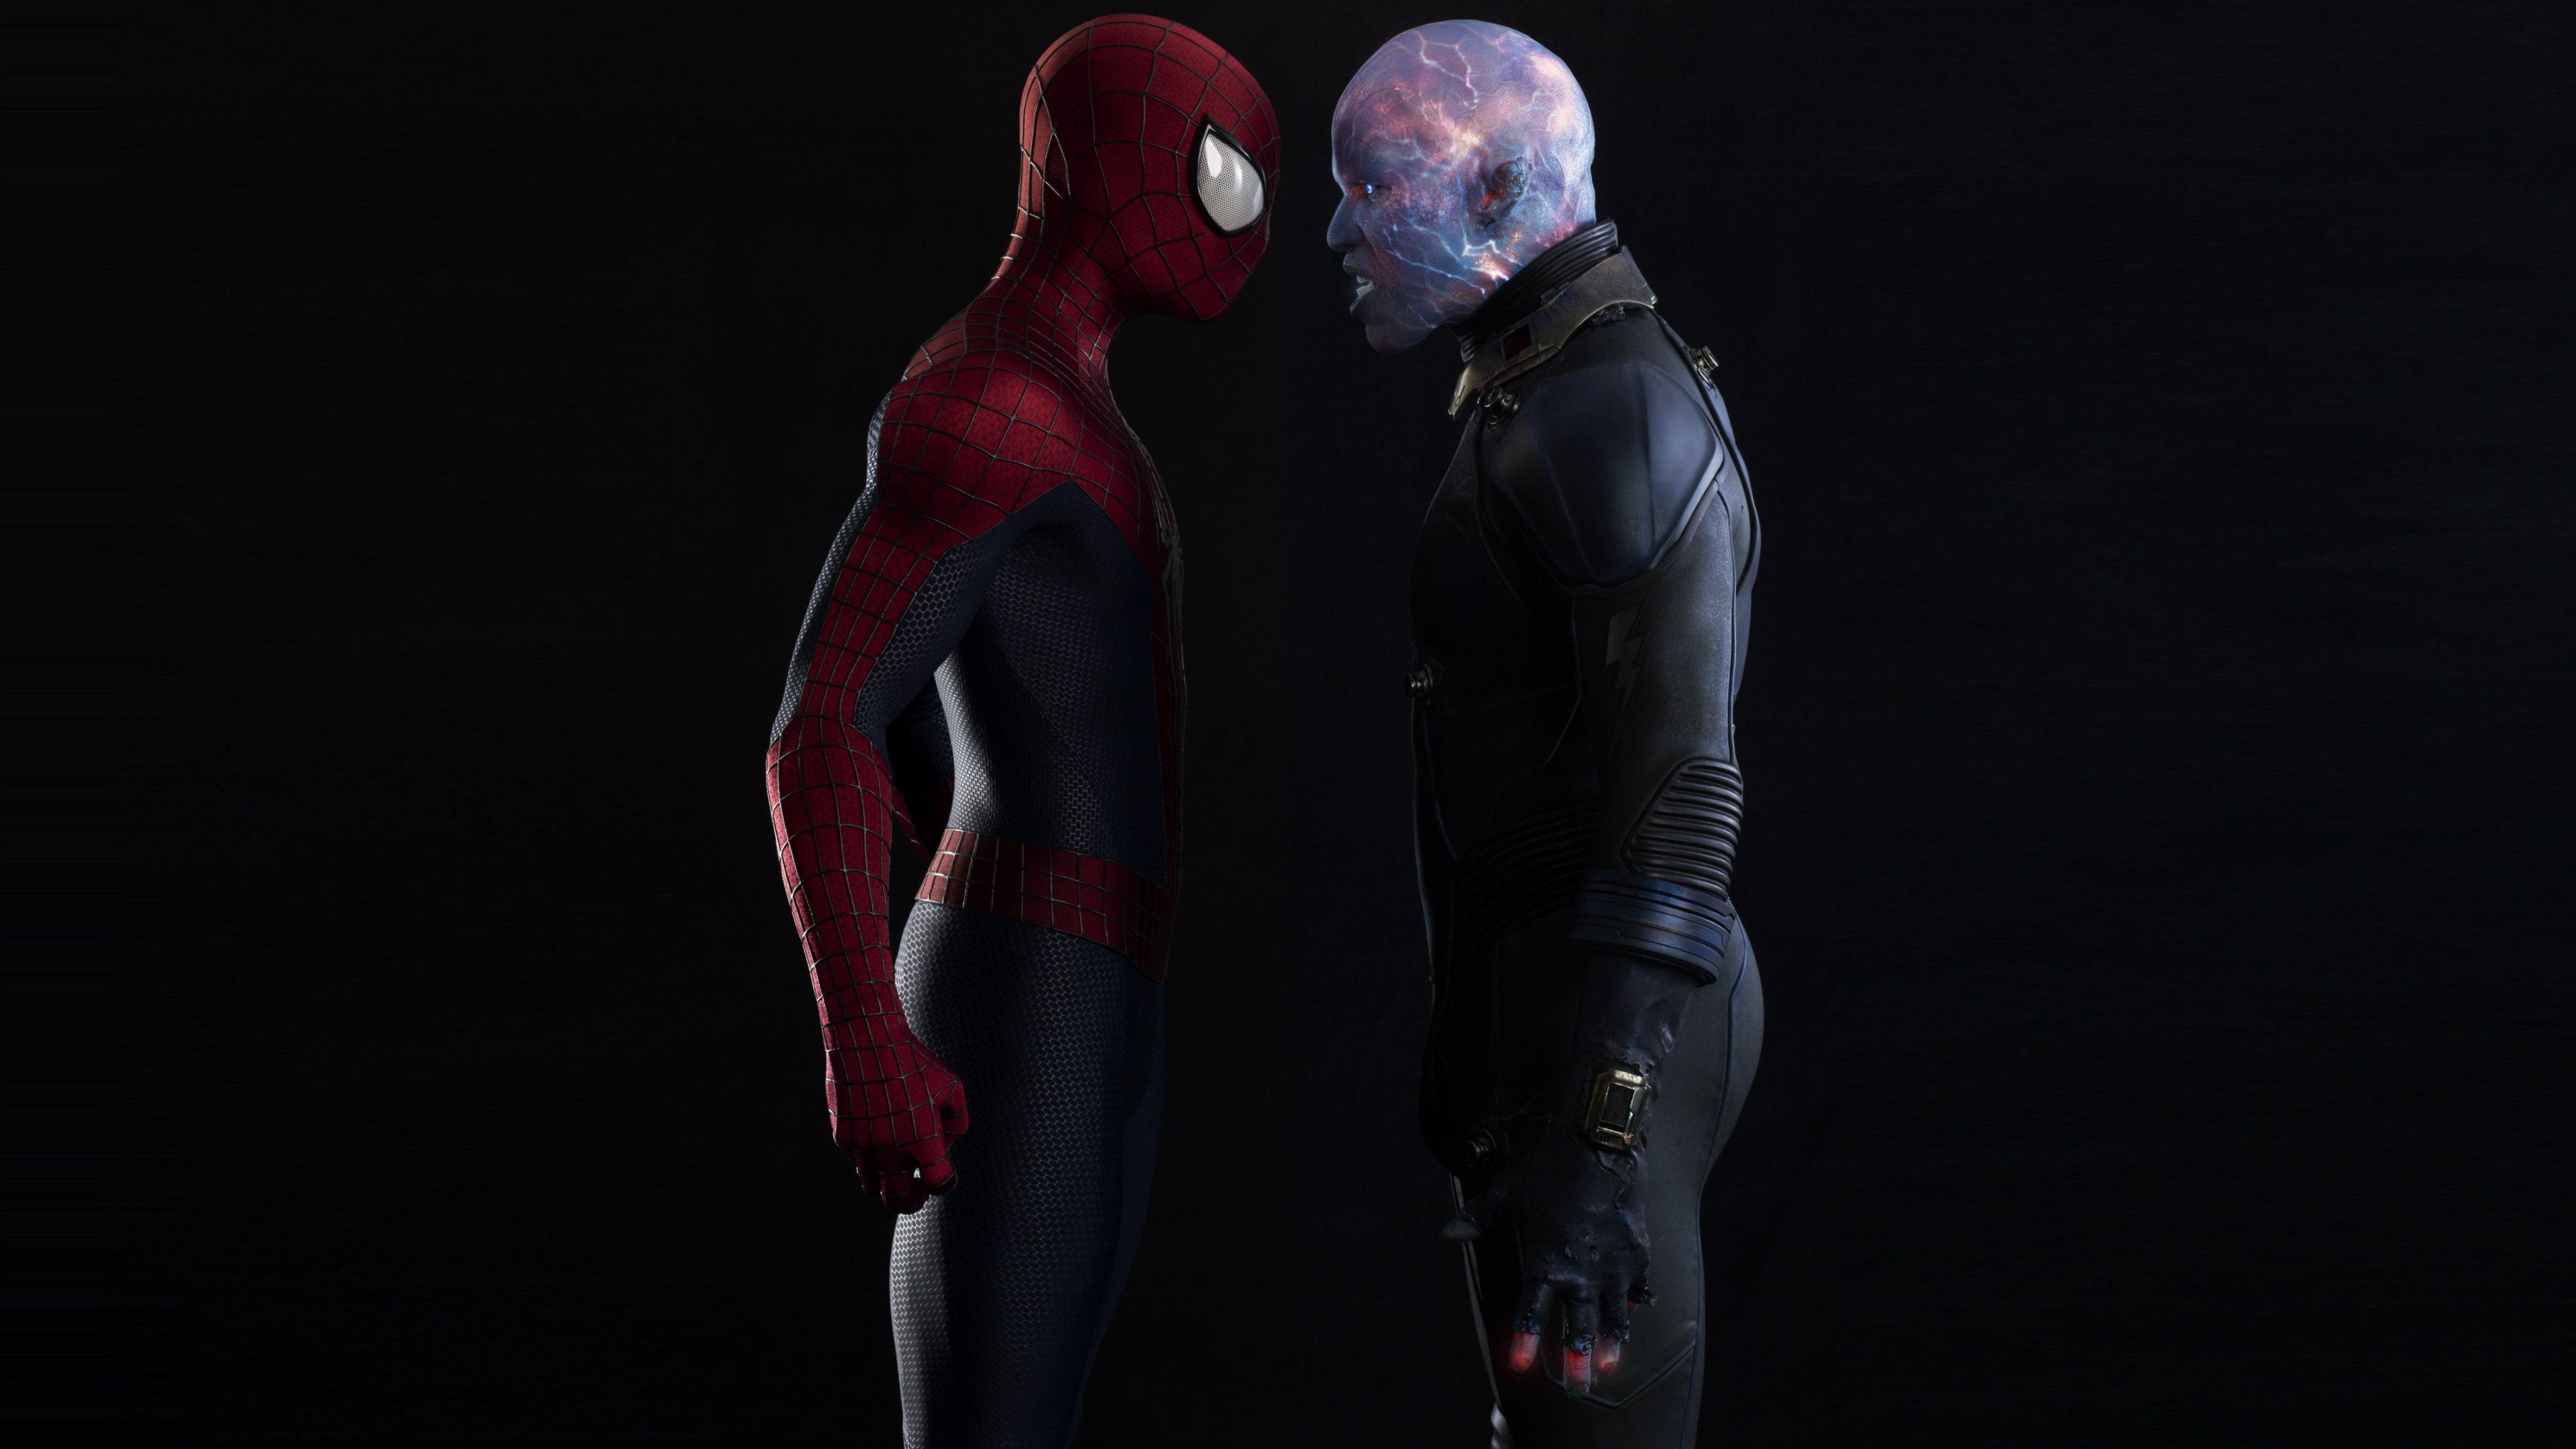 Electro Spider Man Wallpaper Spiderman Vs Electro W...